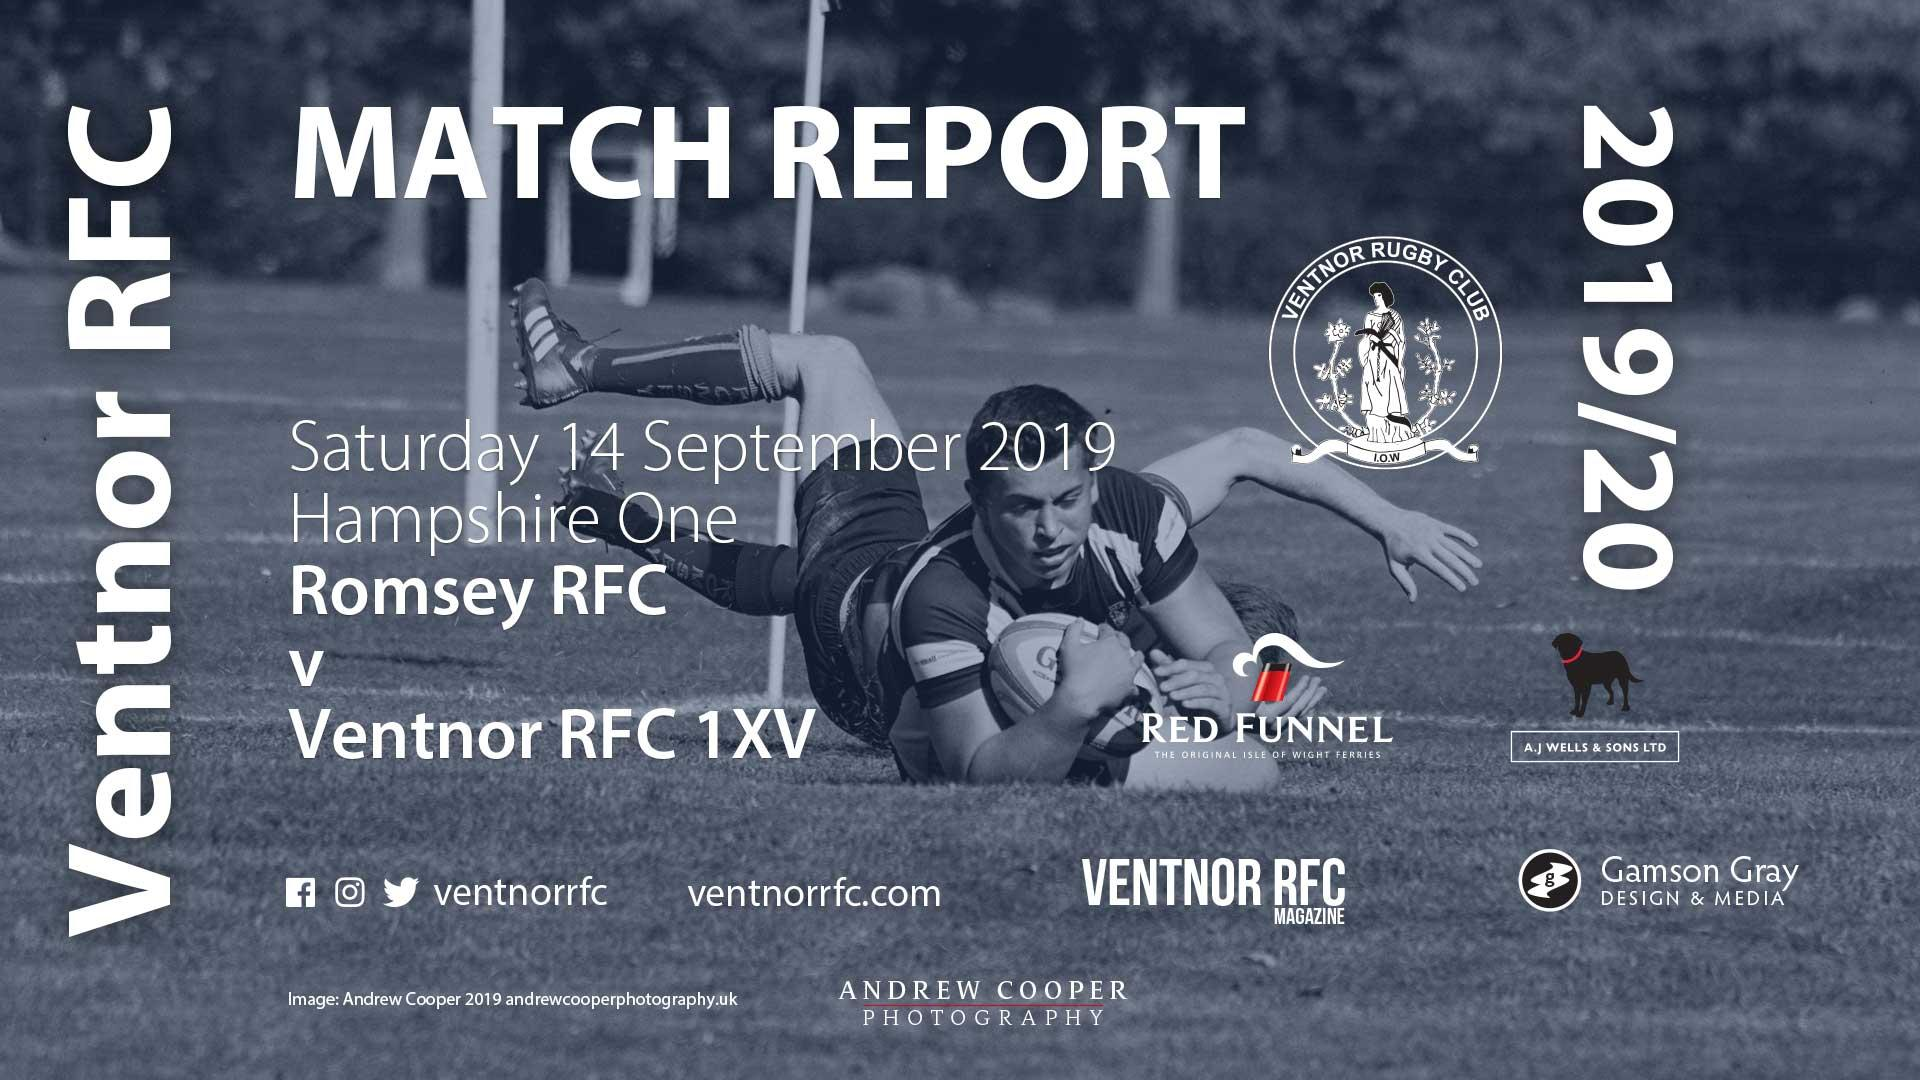 romsey-rfc-v-ventnor-rfc-1xv-match-report-14092019